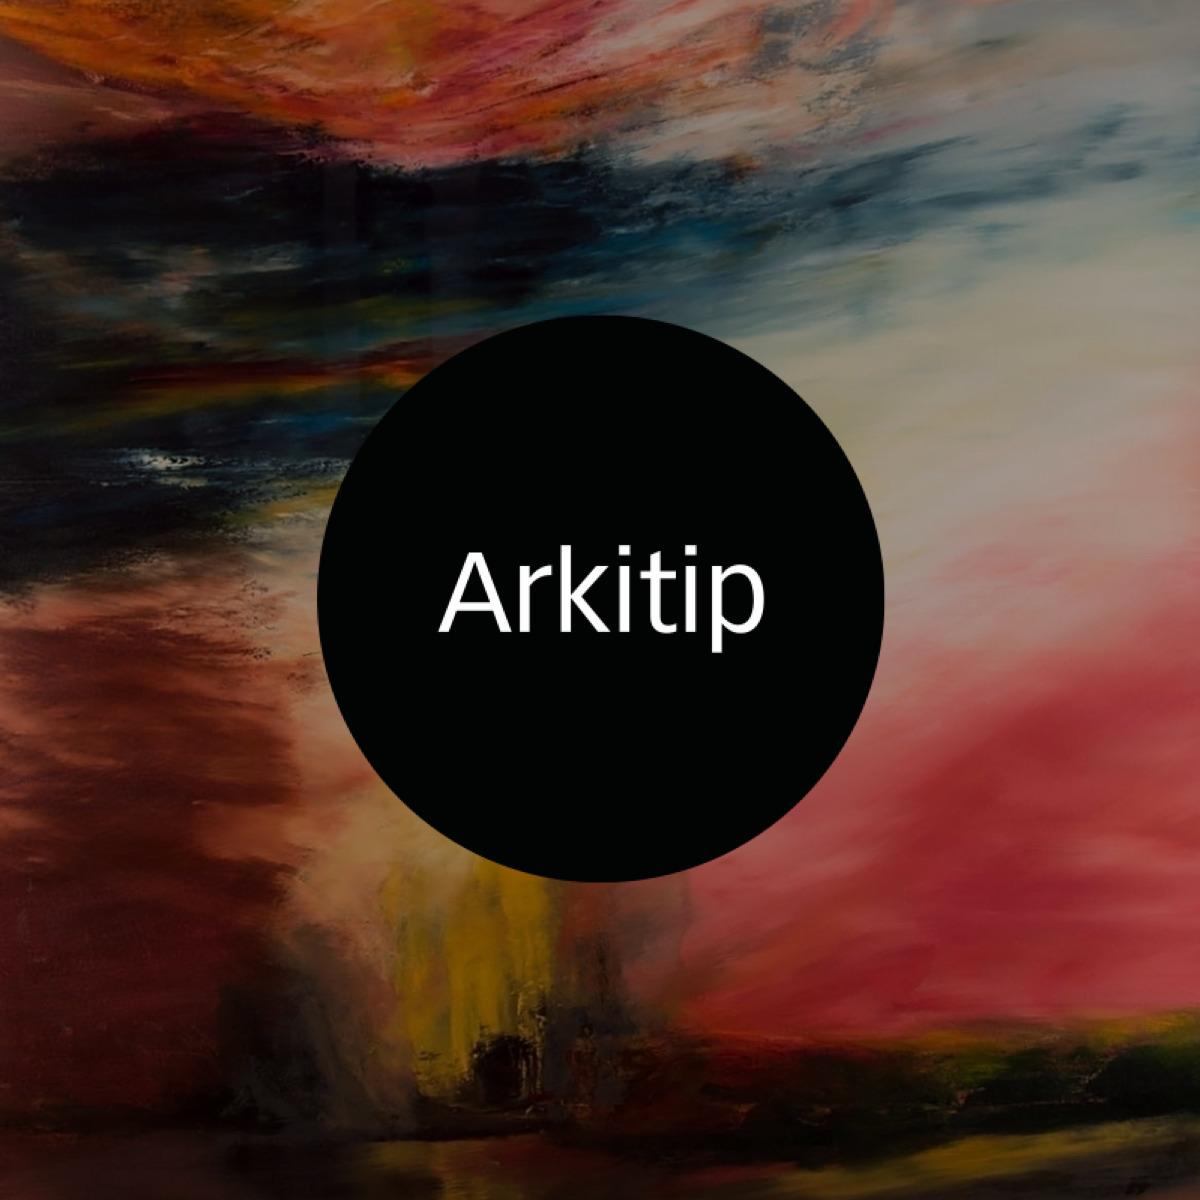 Arkitip Issue No. 0062